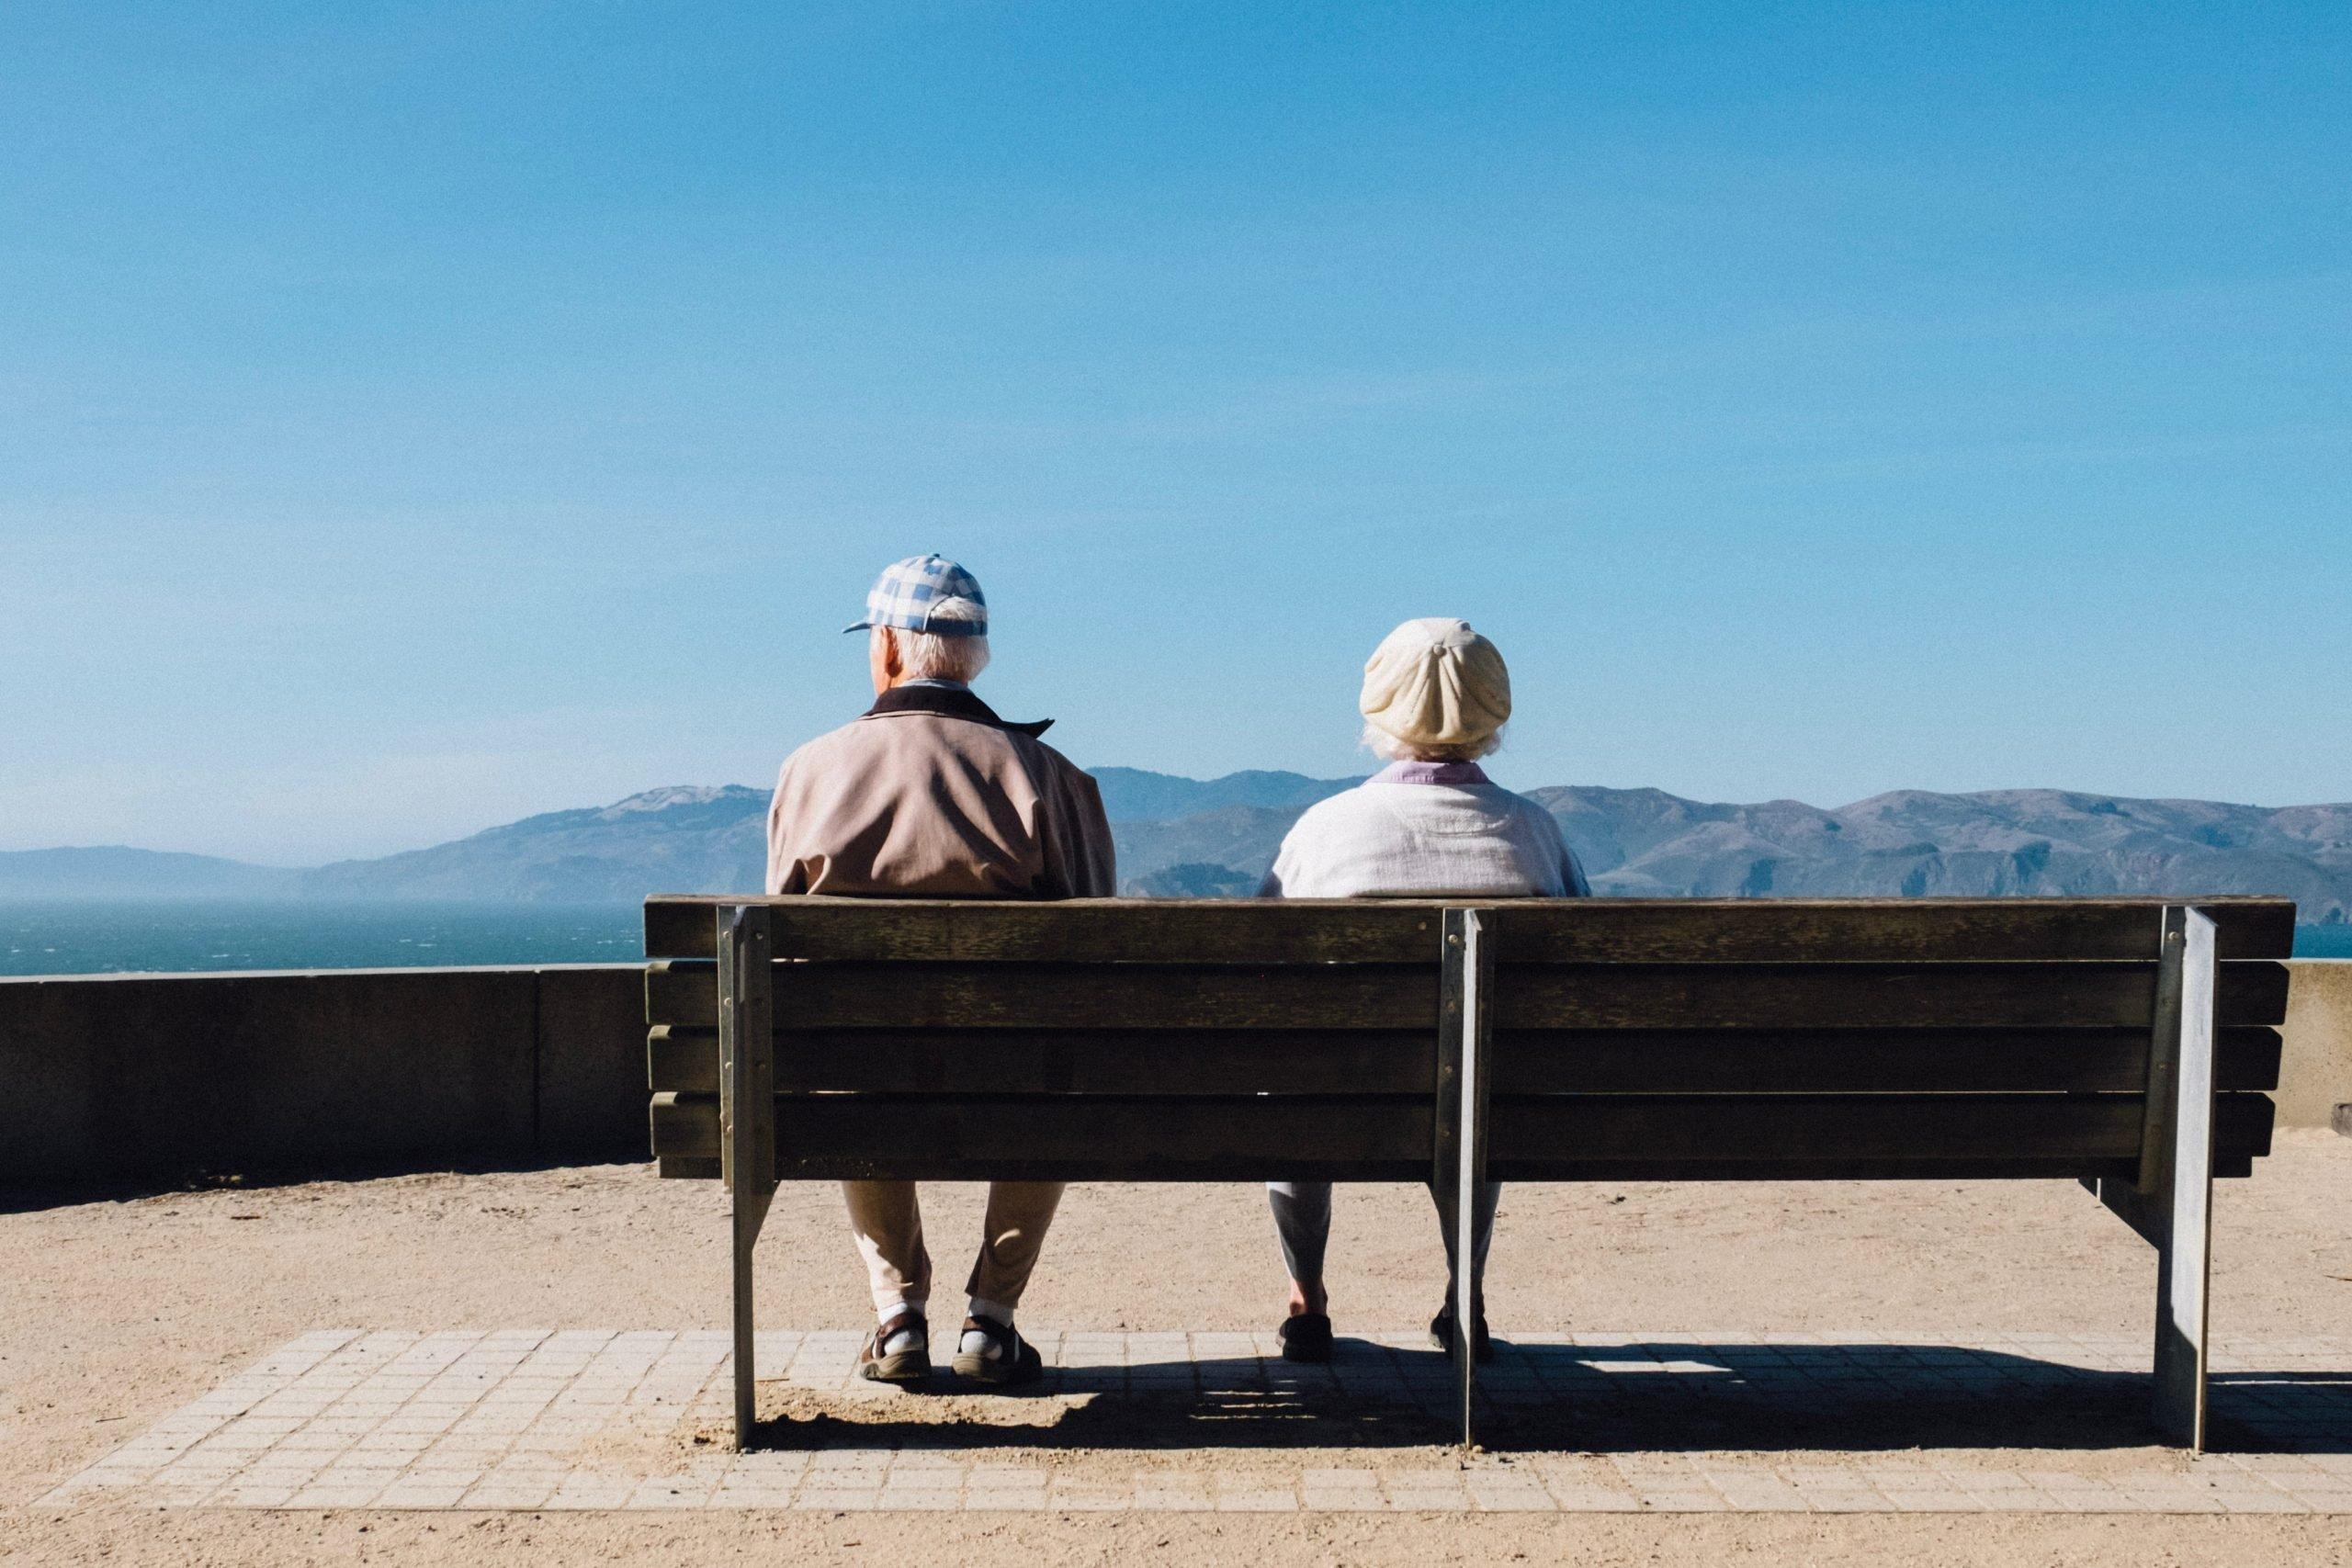 Sunscreen safety for seniors